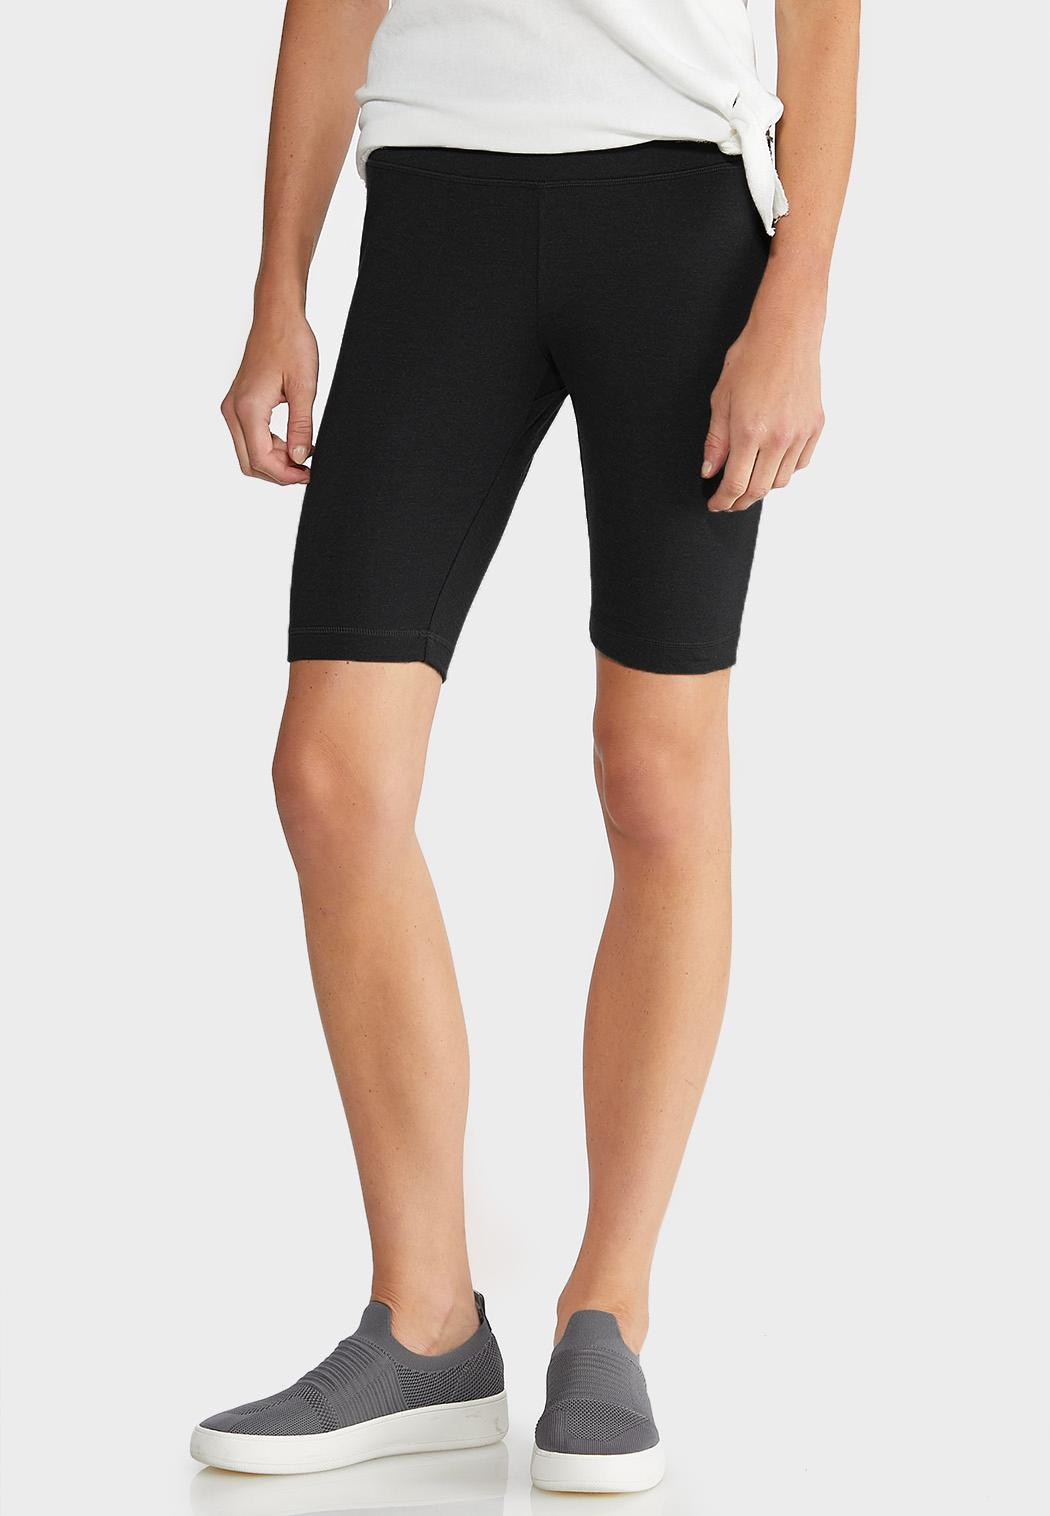 Black Stretch Shorts